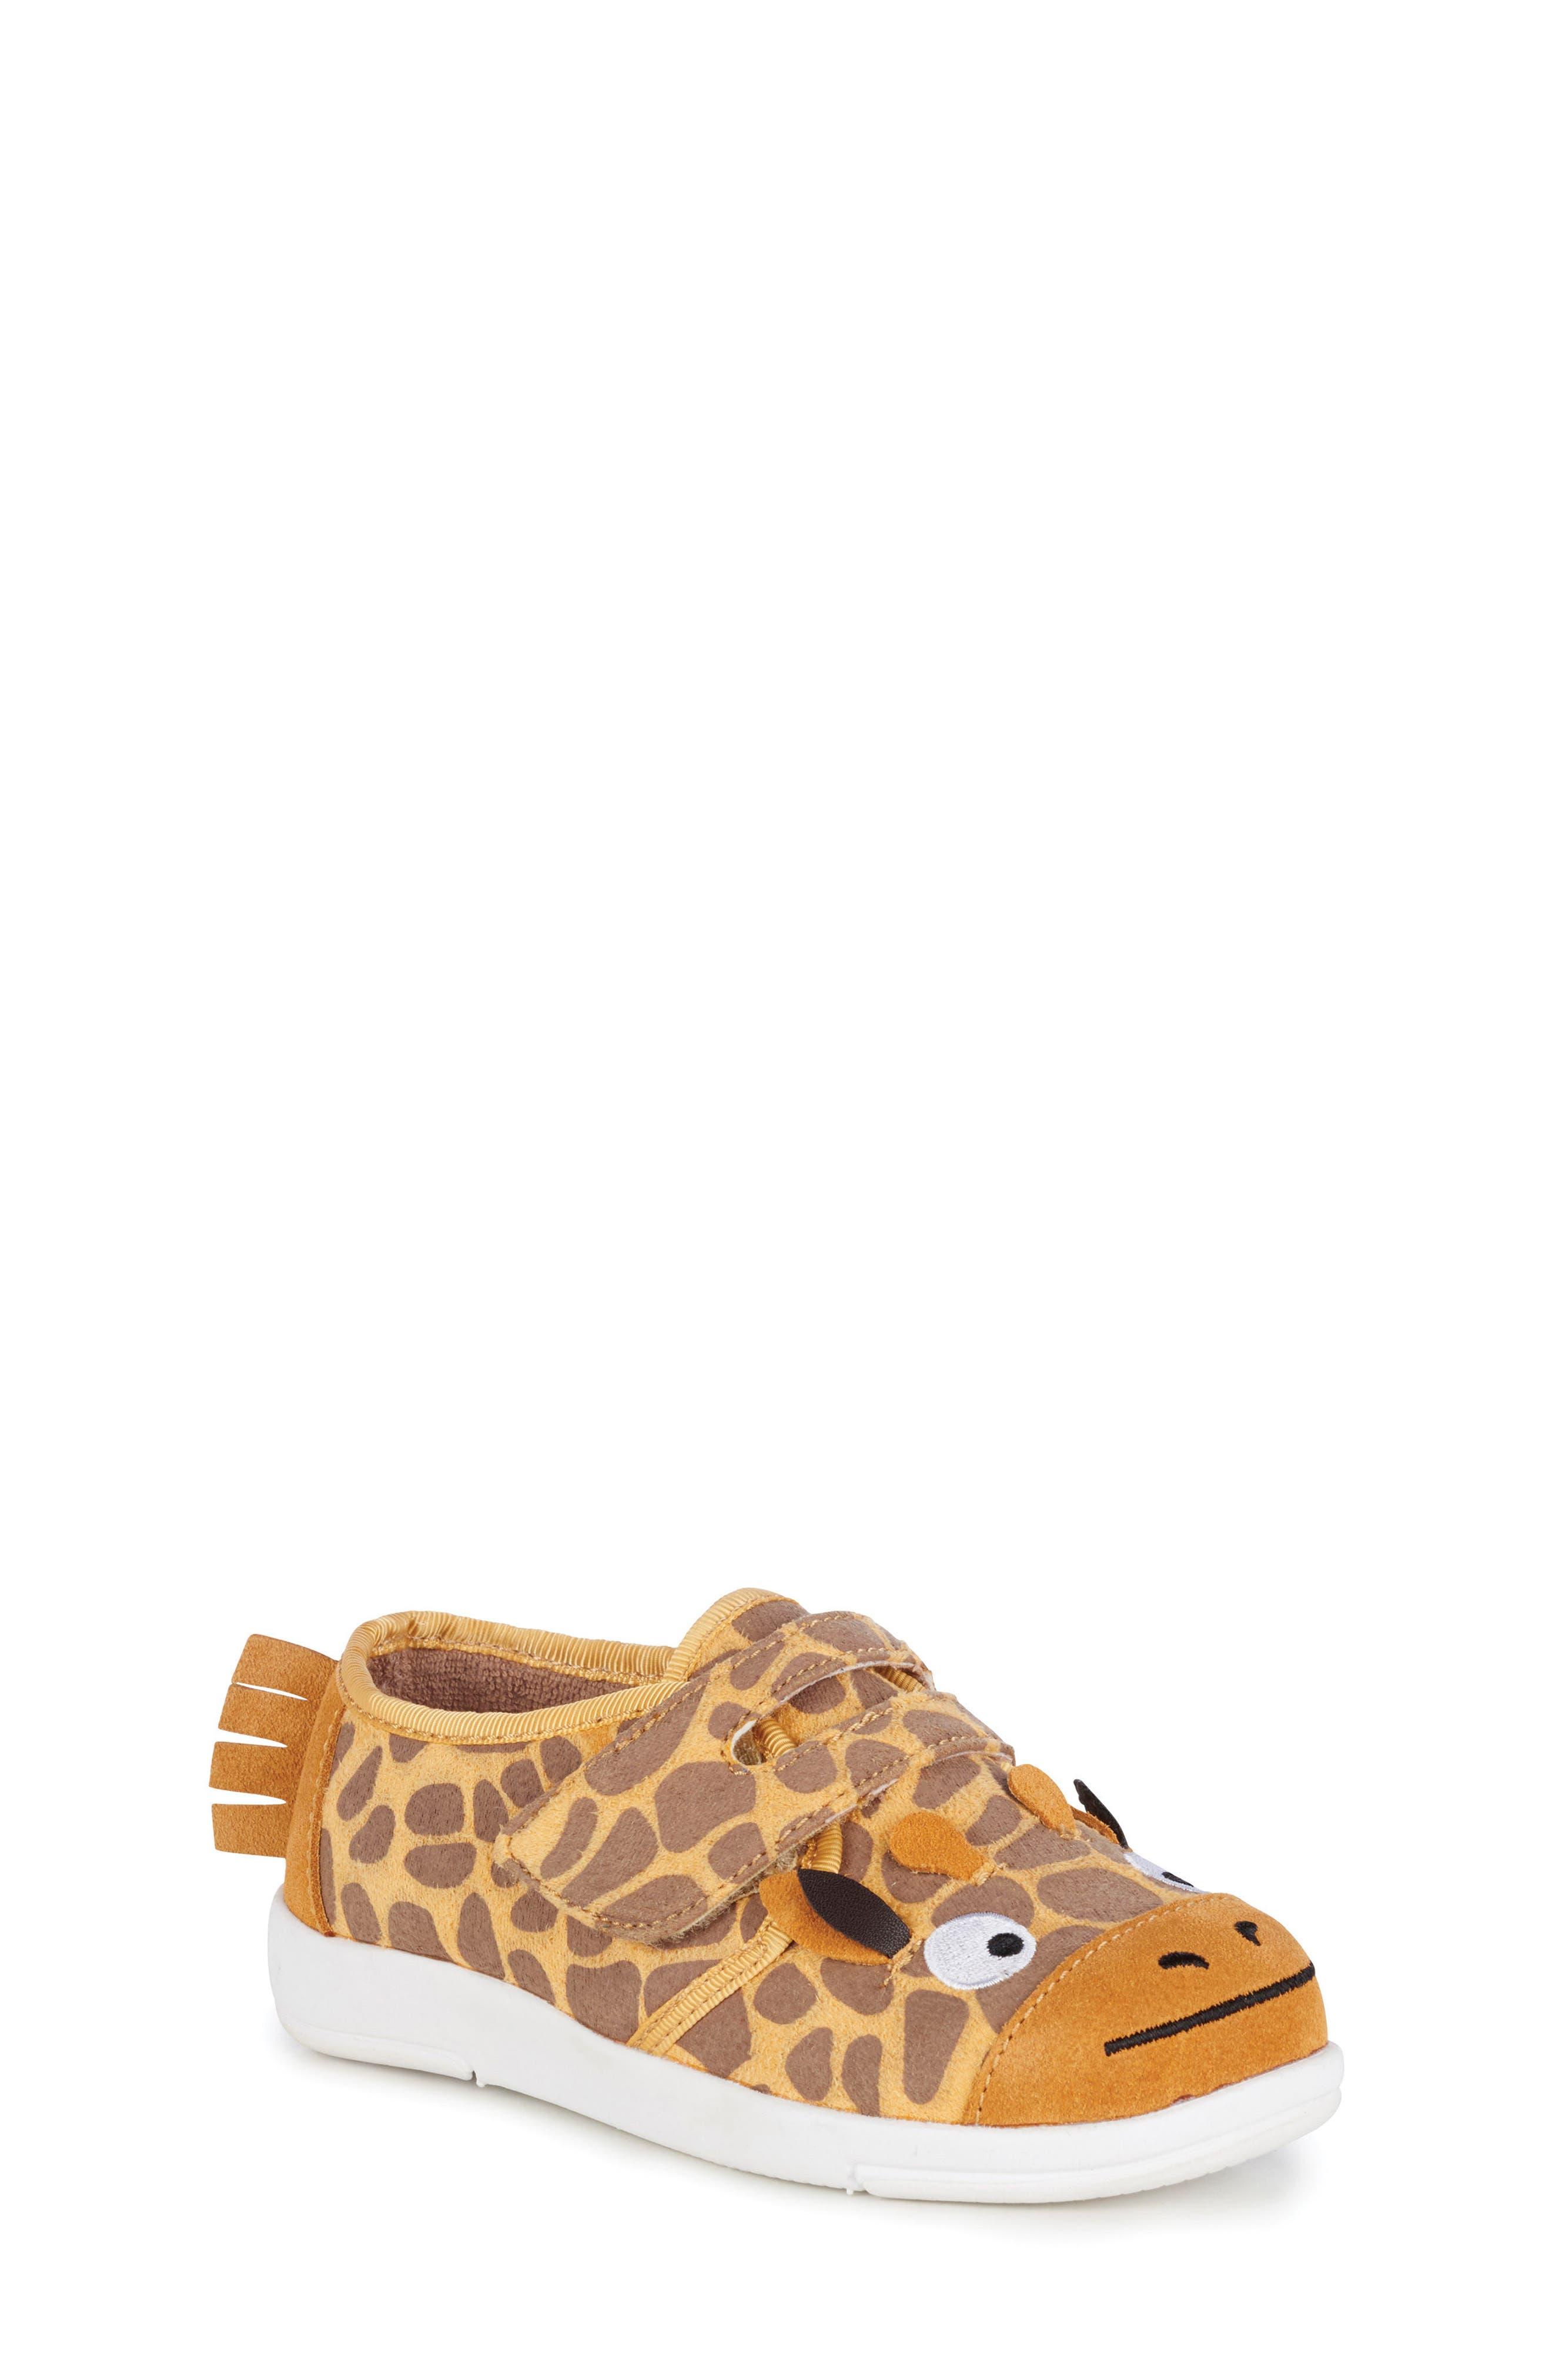 Giraffe Sneaker,                         Main,                         color, Yellow